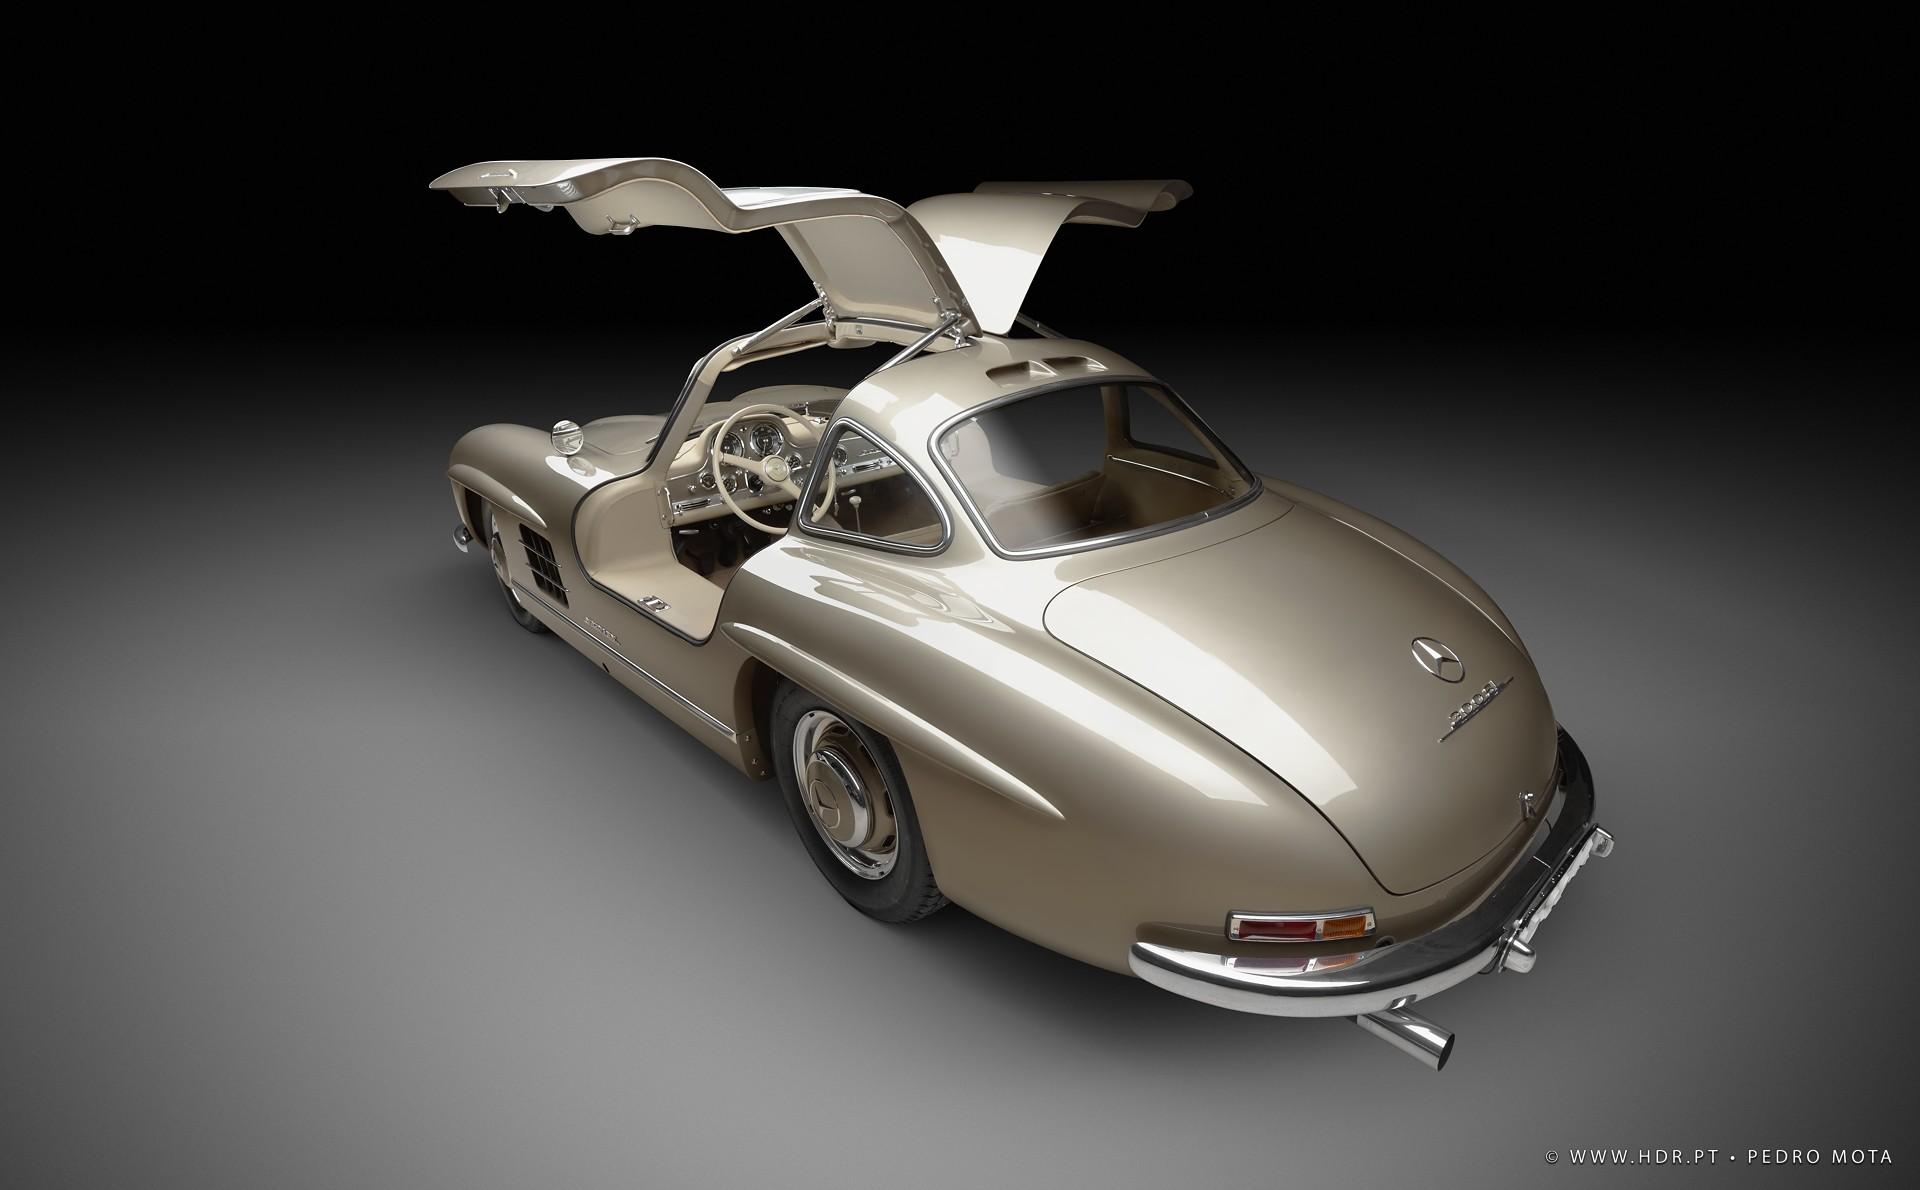 Mercedes 300 SL 1955 - Automotive Photography - Pedro Mota